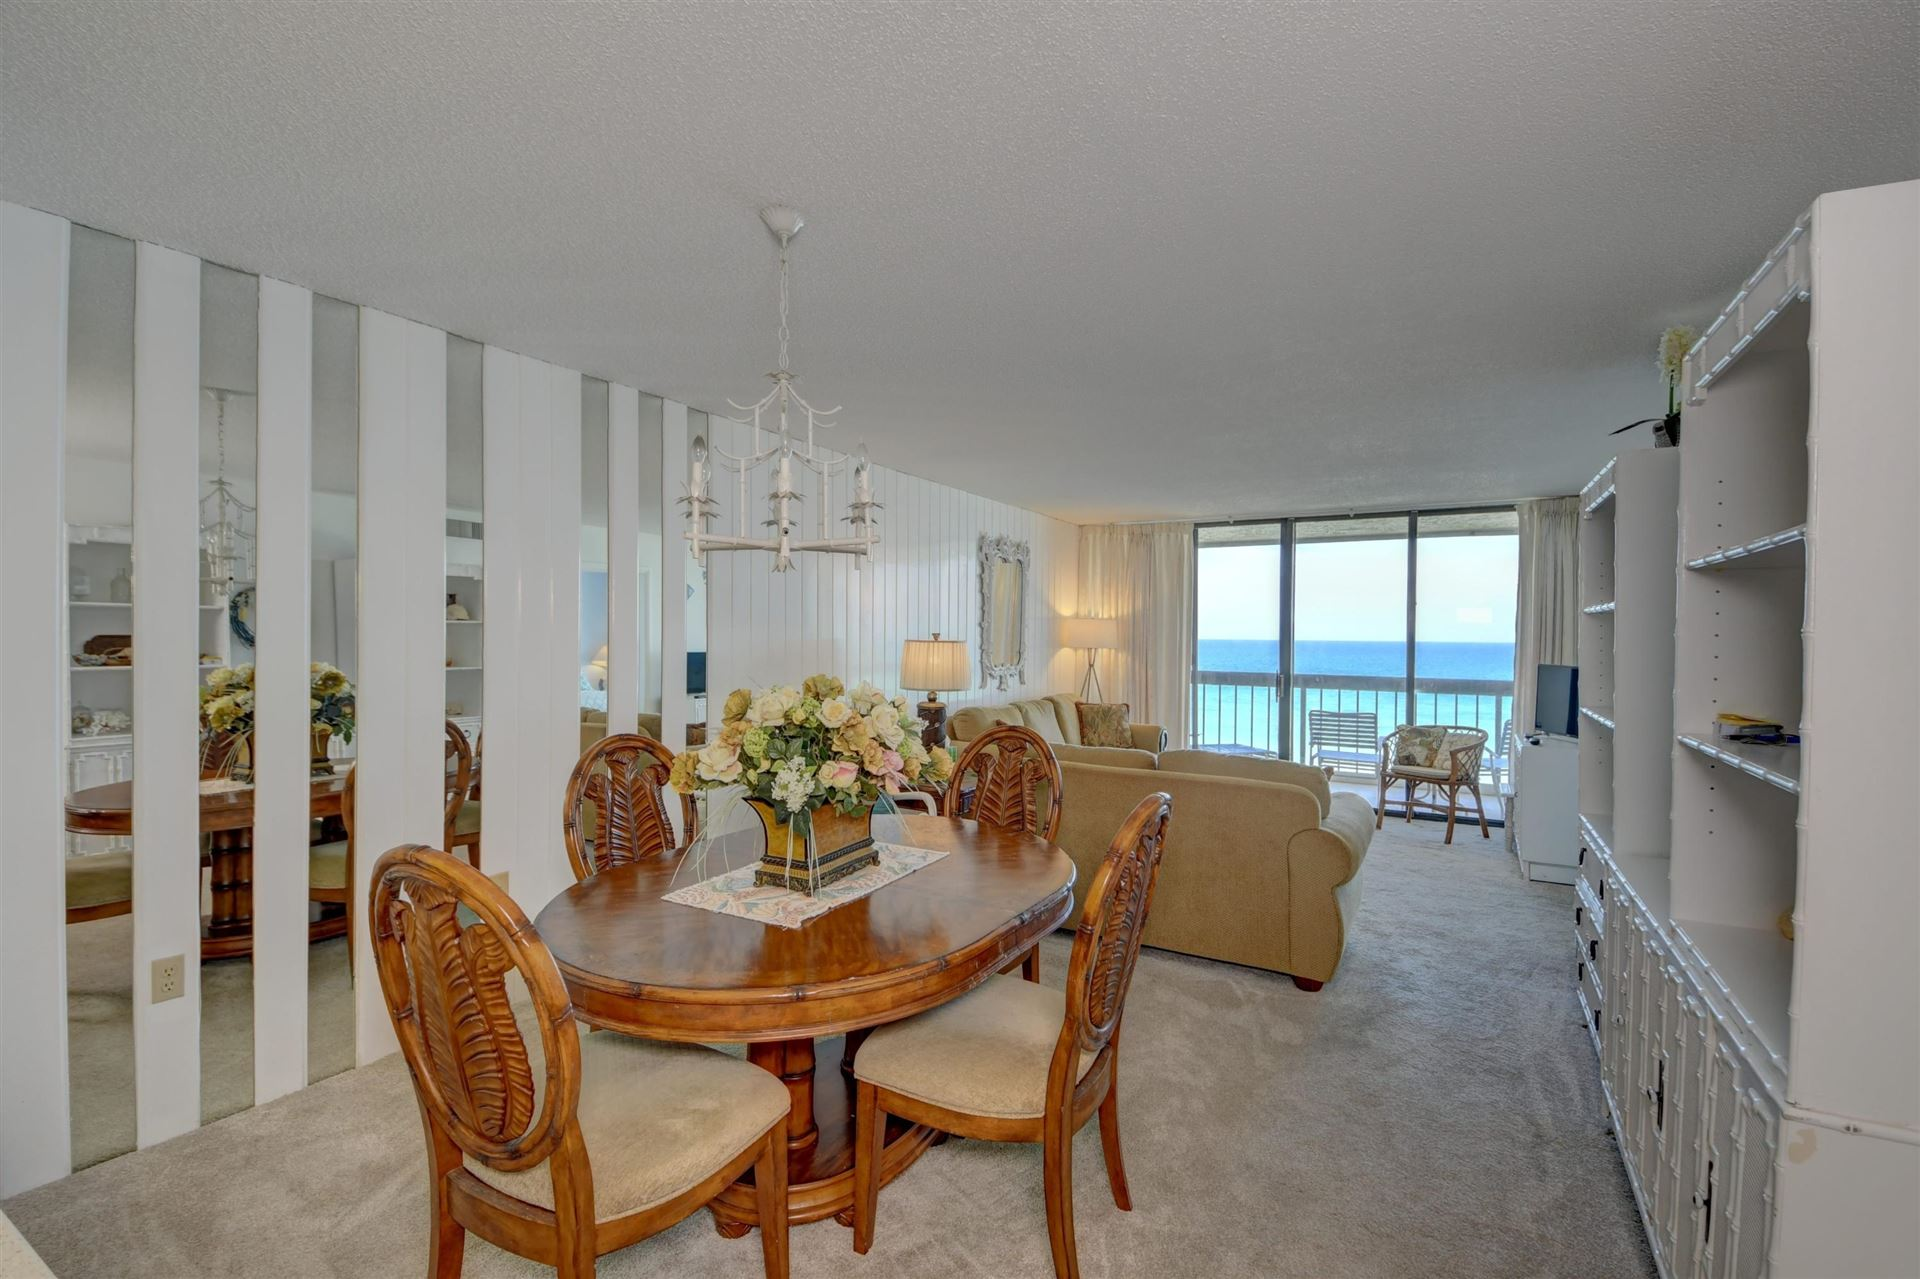 Photo of 9940 S Ocean S Drive #409, Jensen Beach, FL 34957 (MLS # RX-10643572)